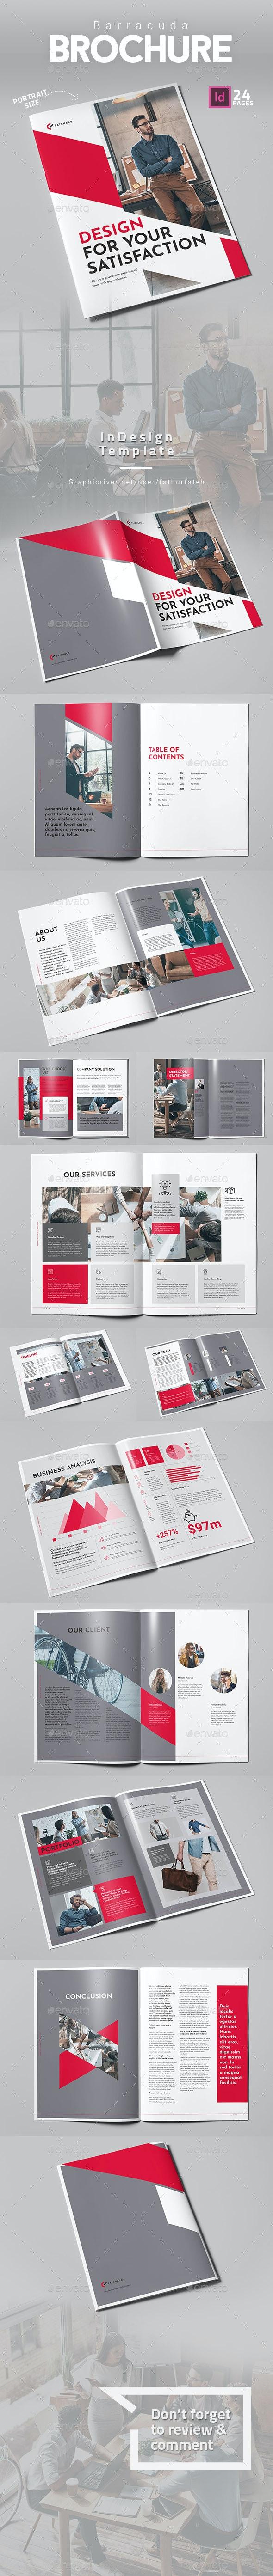 Barracuda Brochure - Corporate Brochures